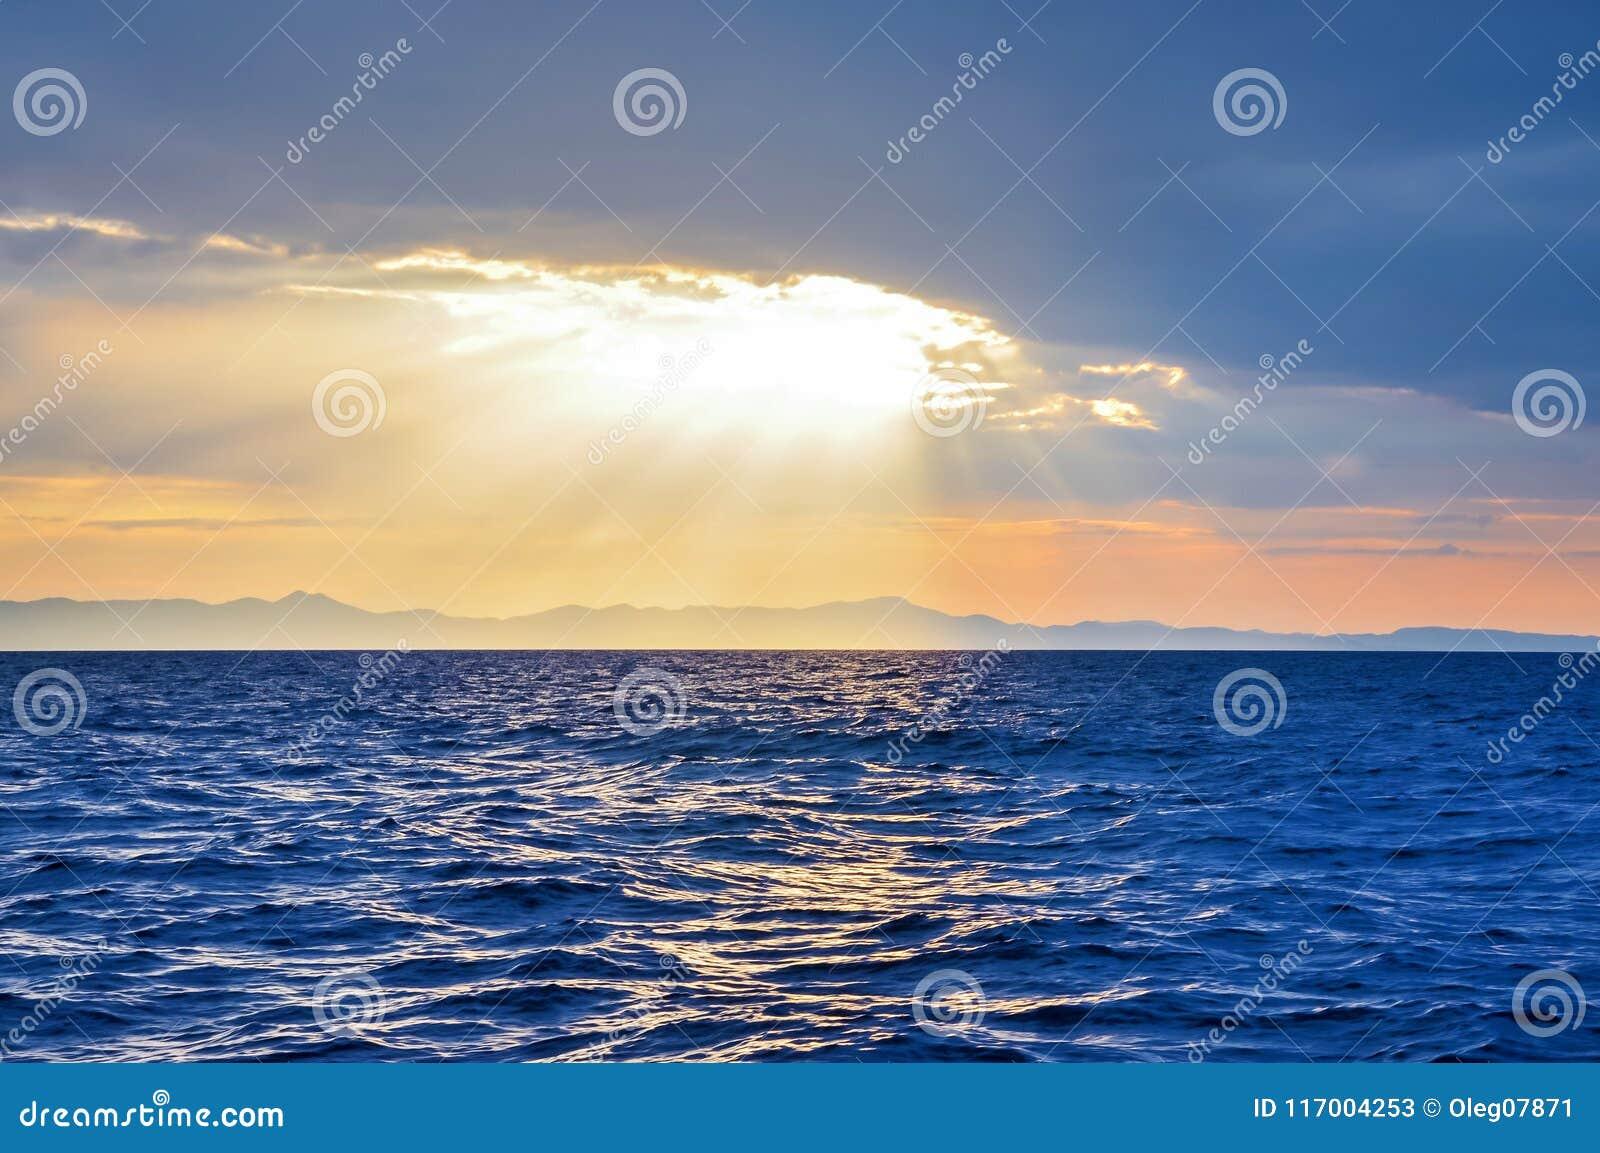 Zonsondergang boven gezien overzees